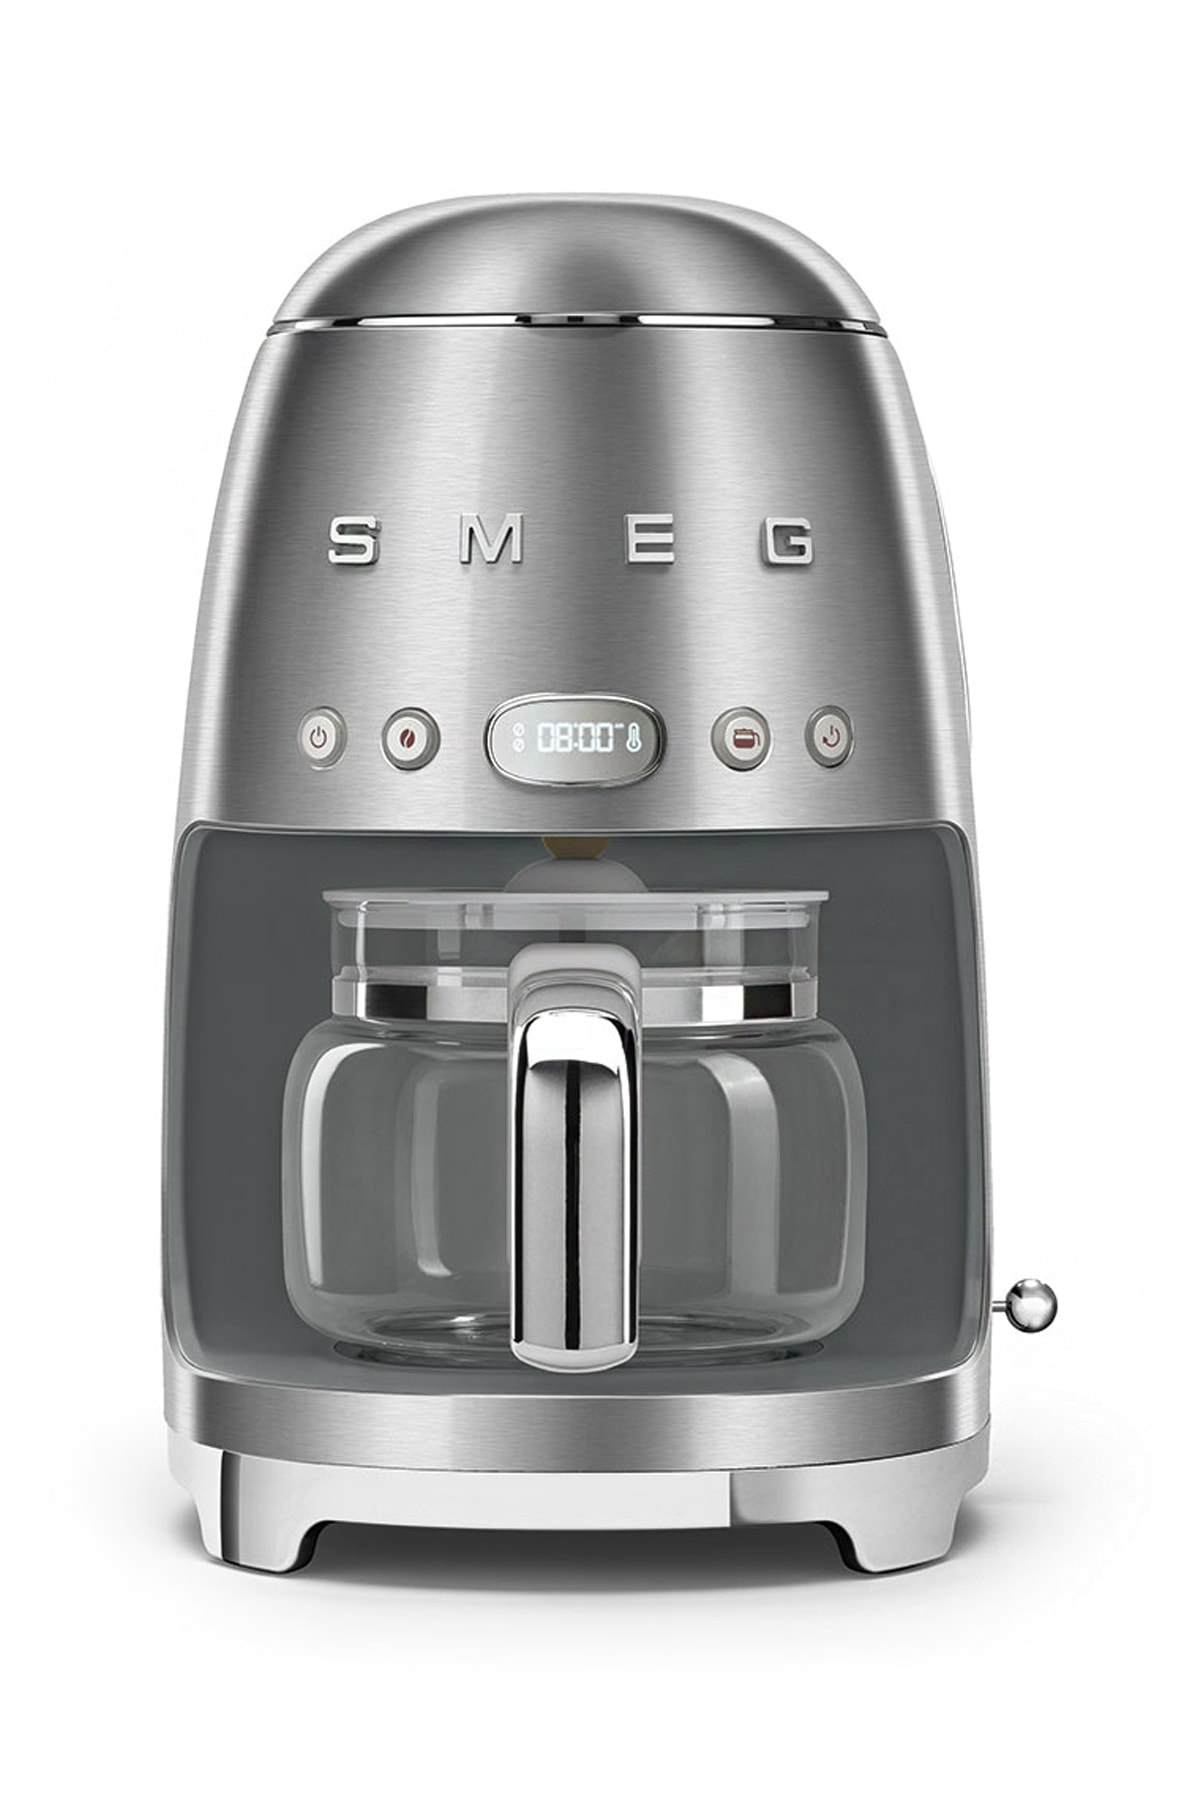 SMEG Çelik Filtre Kahve Makinası 50's Retro Dcf02sseu 1